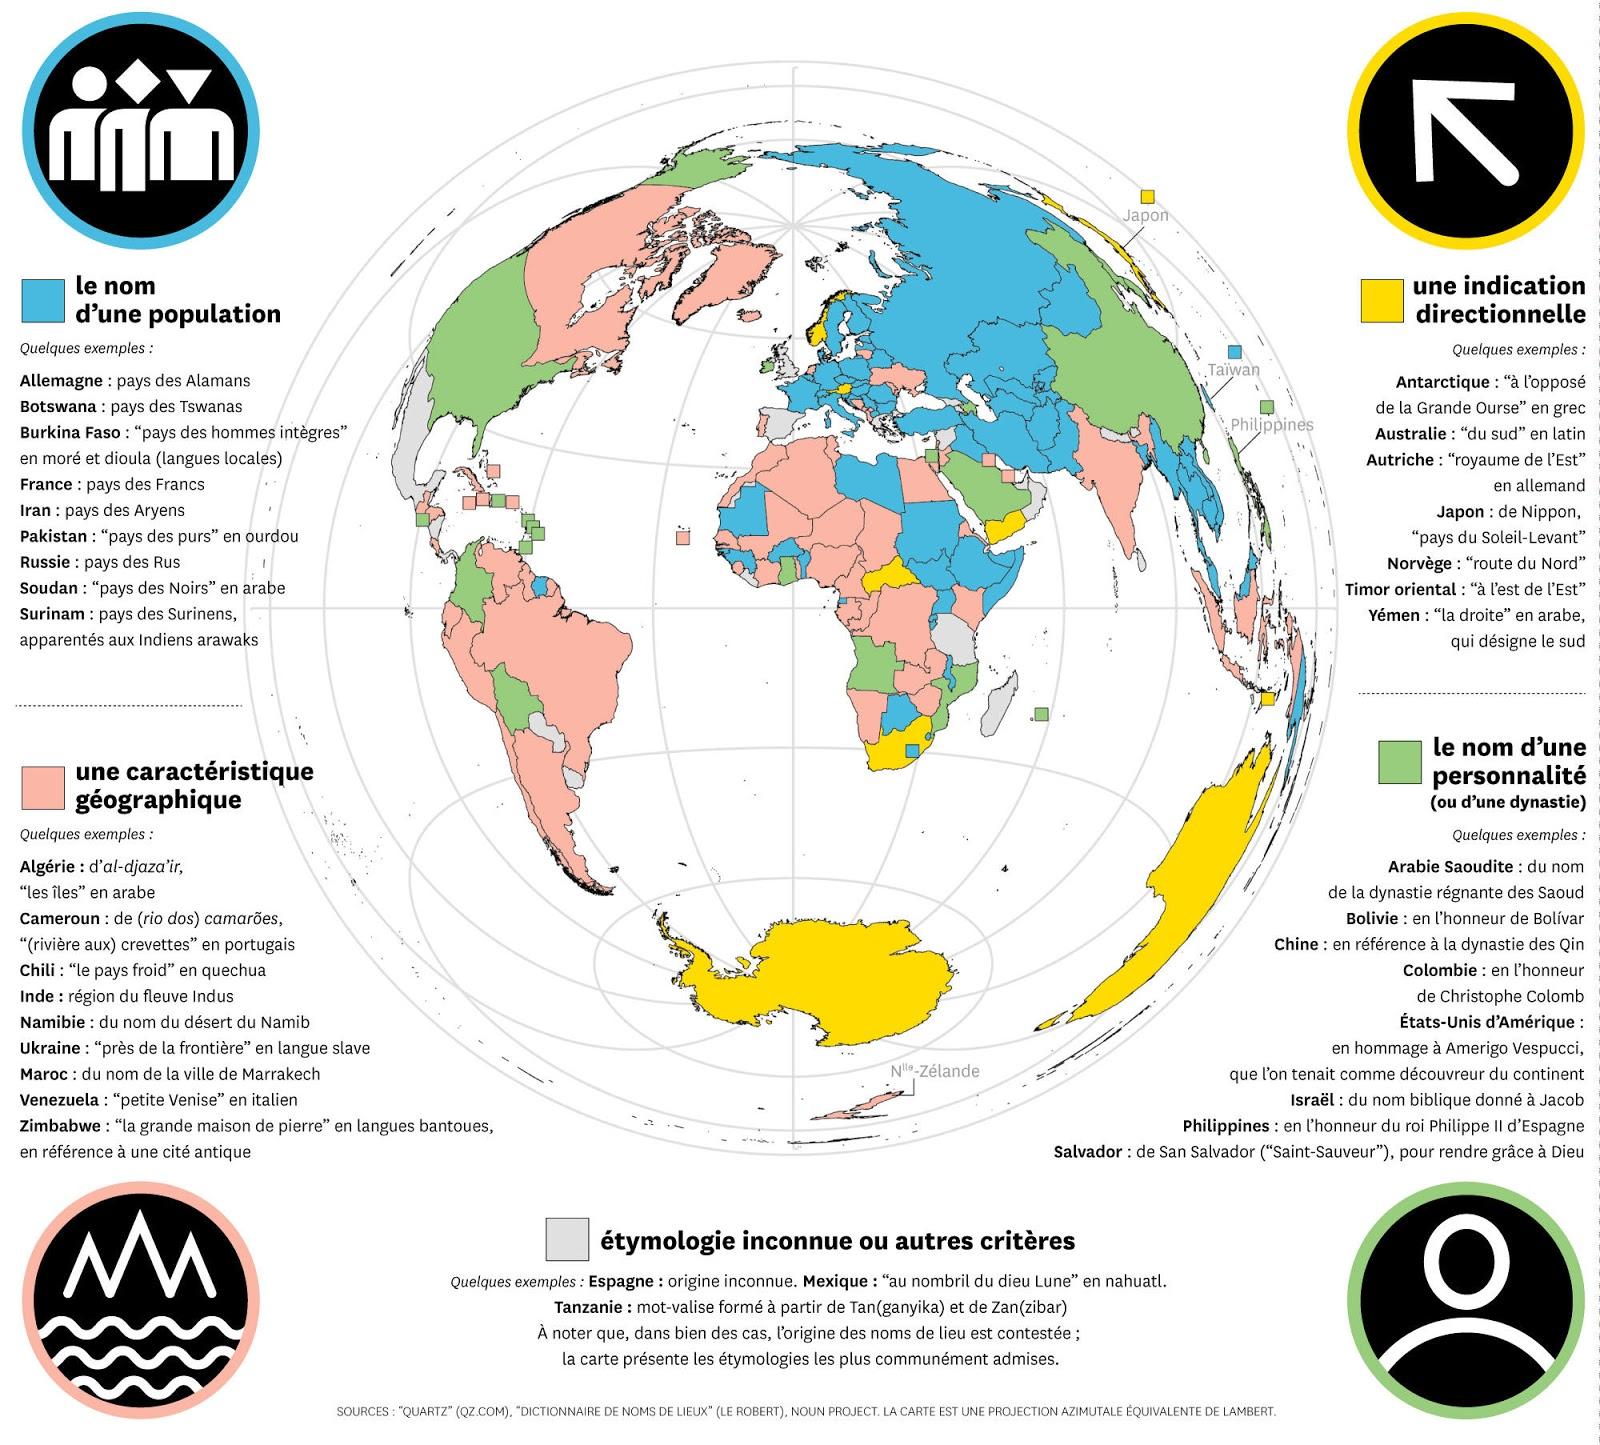 Carte Australie Chine.Pourquoi Dit On Australie France Chine Ou Ghana Ghana